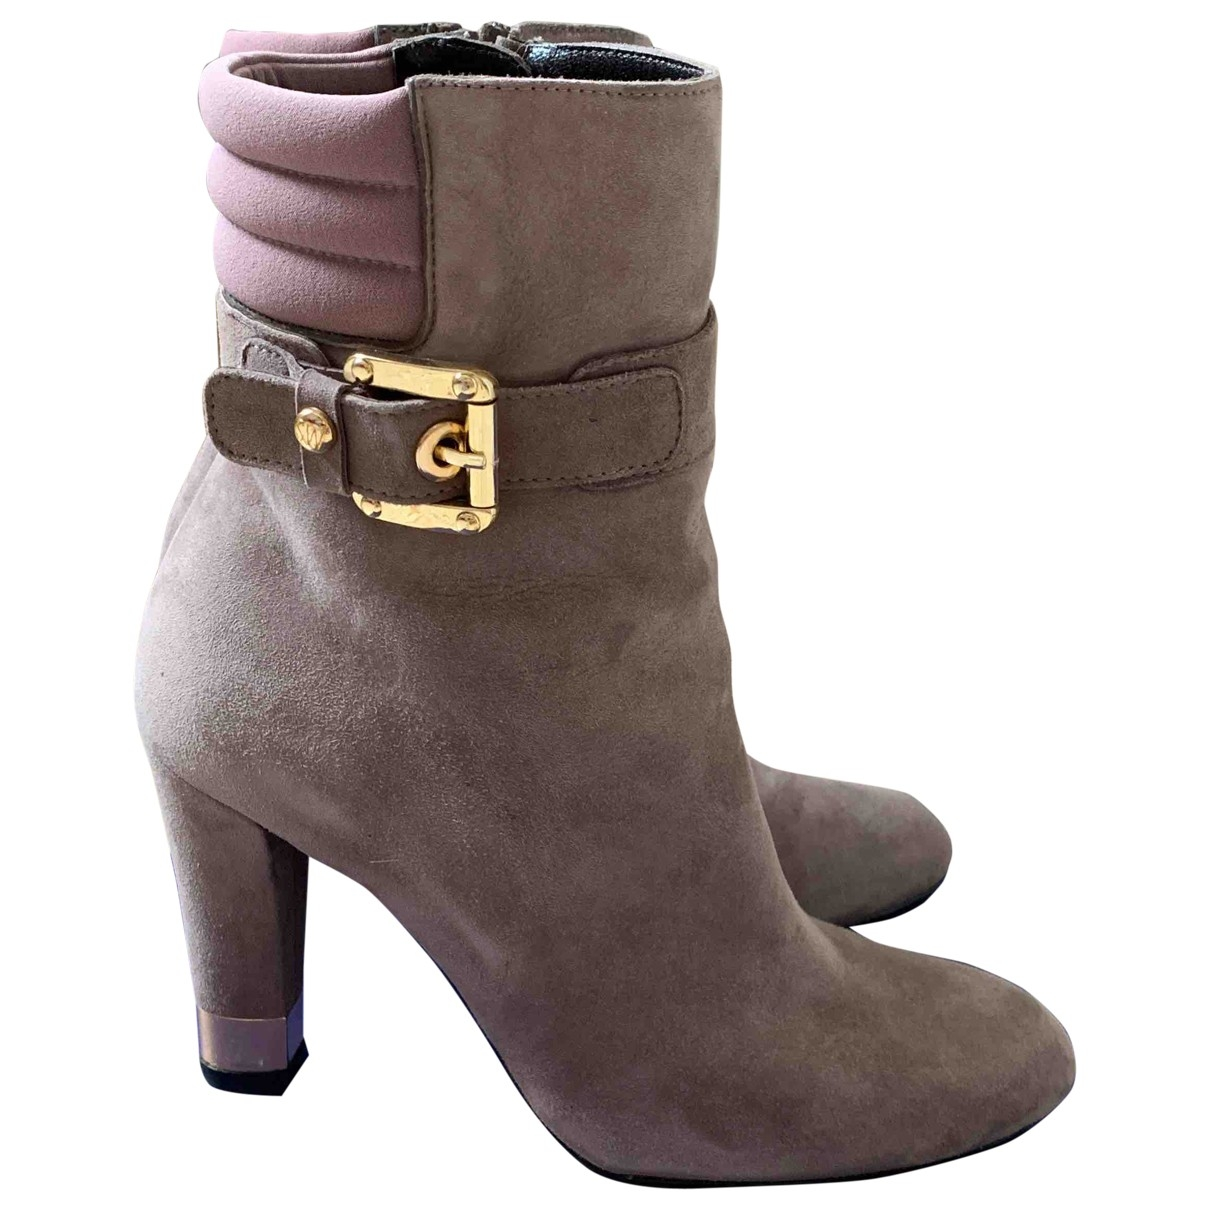 Stuart Weitzman \N Suede Ankle boots for Women 37 IT